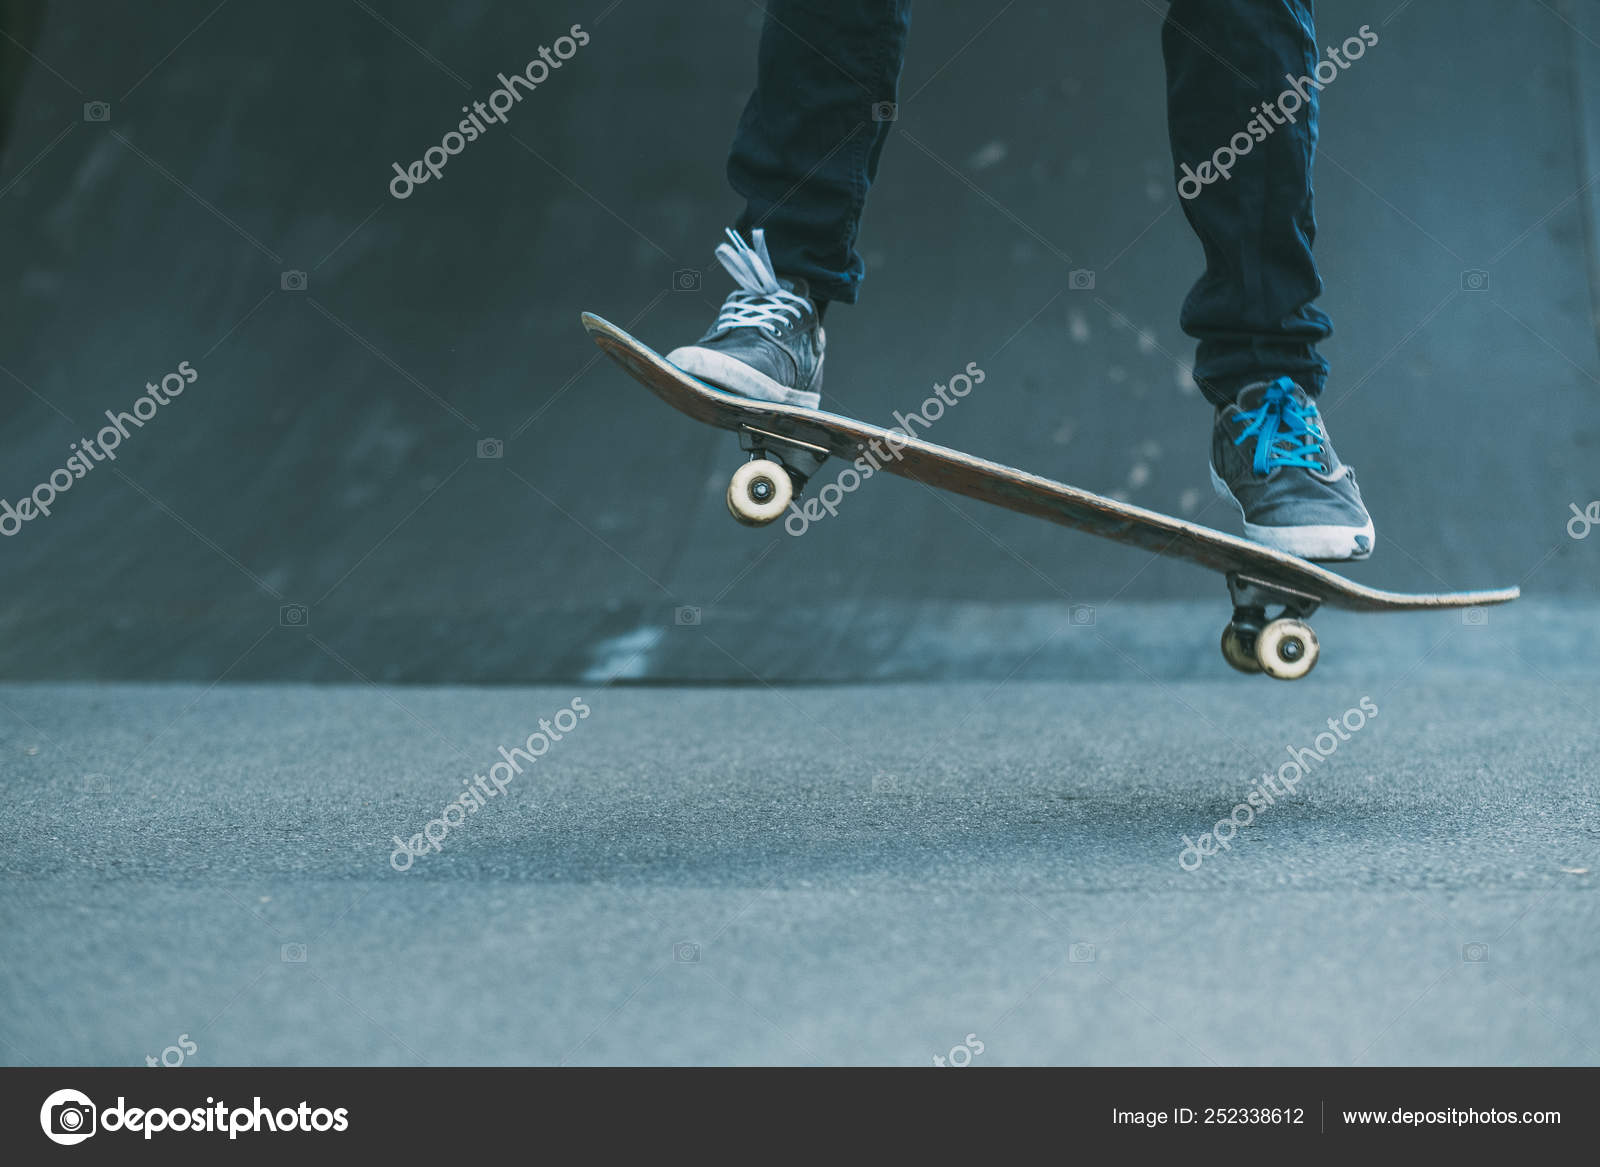 dcd35d04 Urban man hobby skateboarding leisure trick park — Stock Photo ...